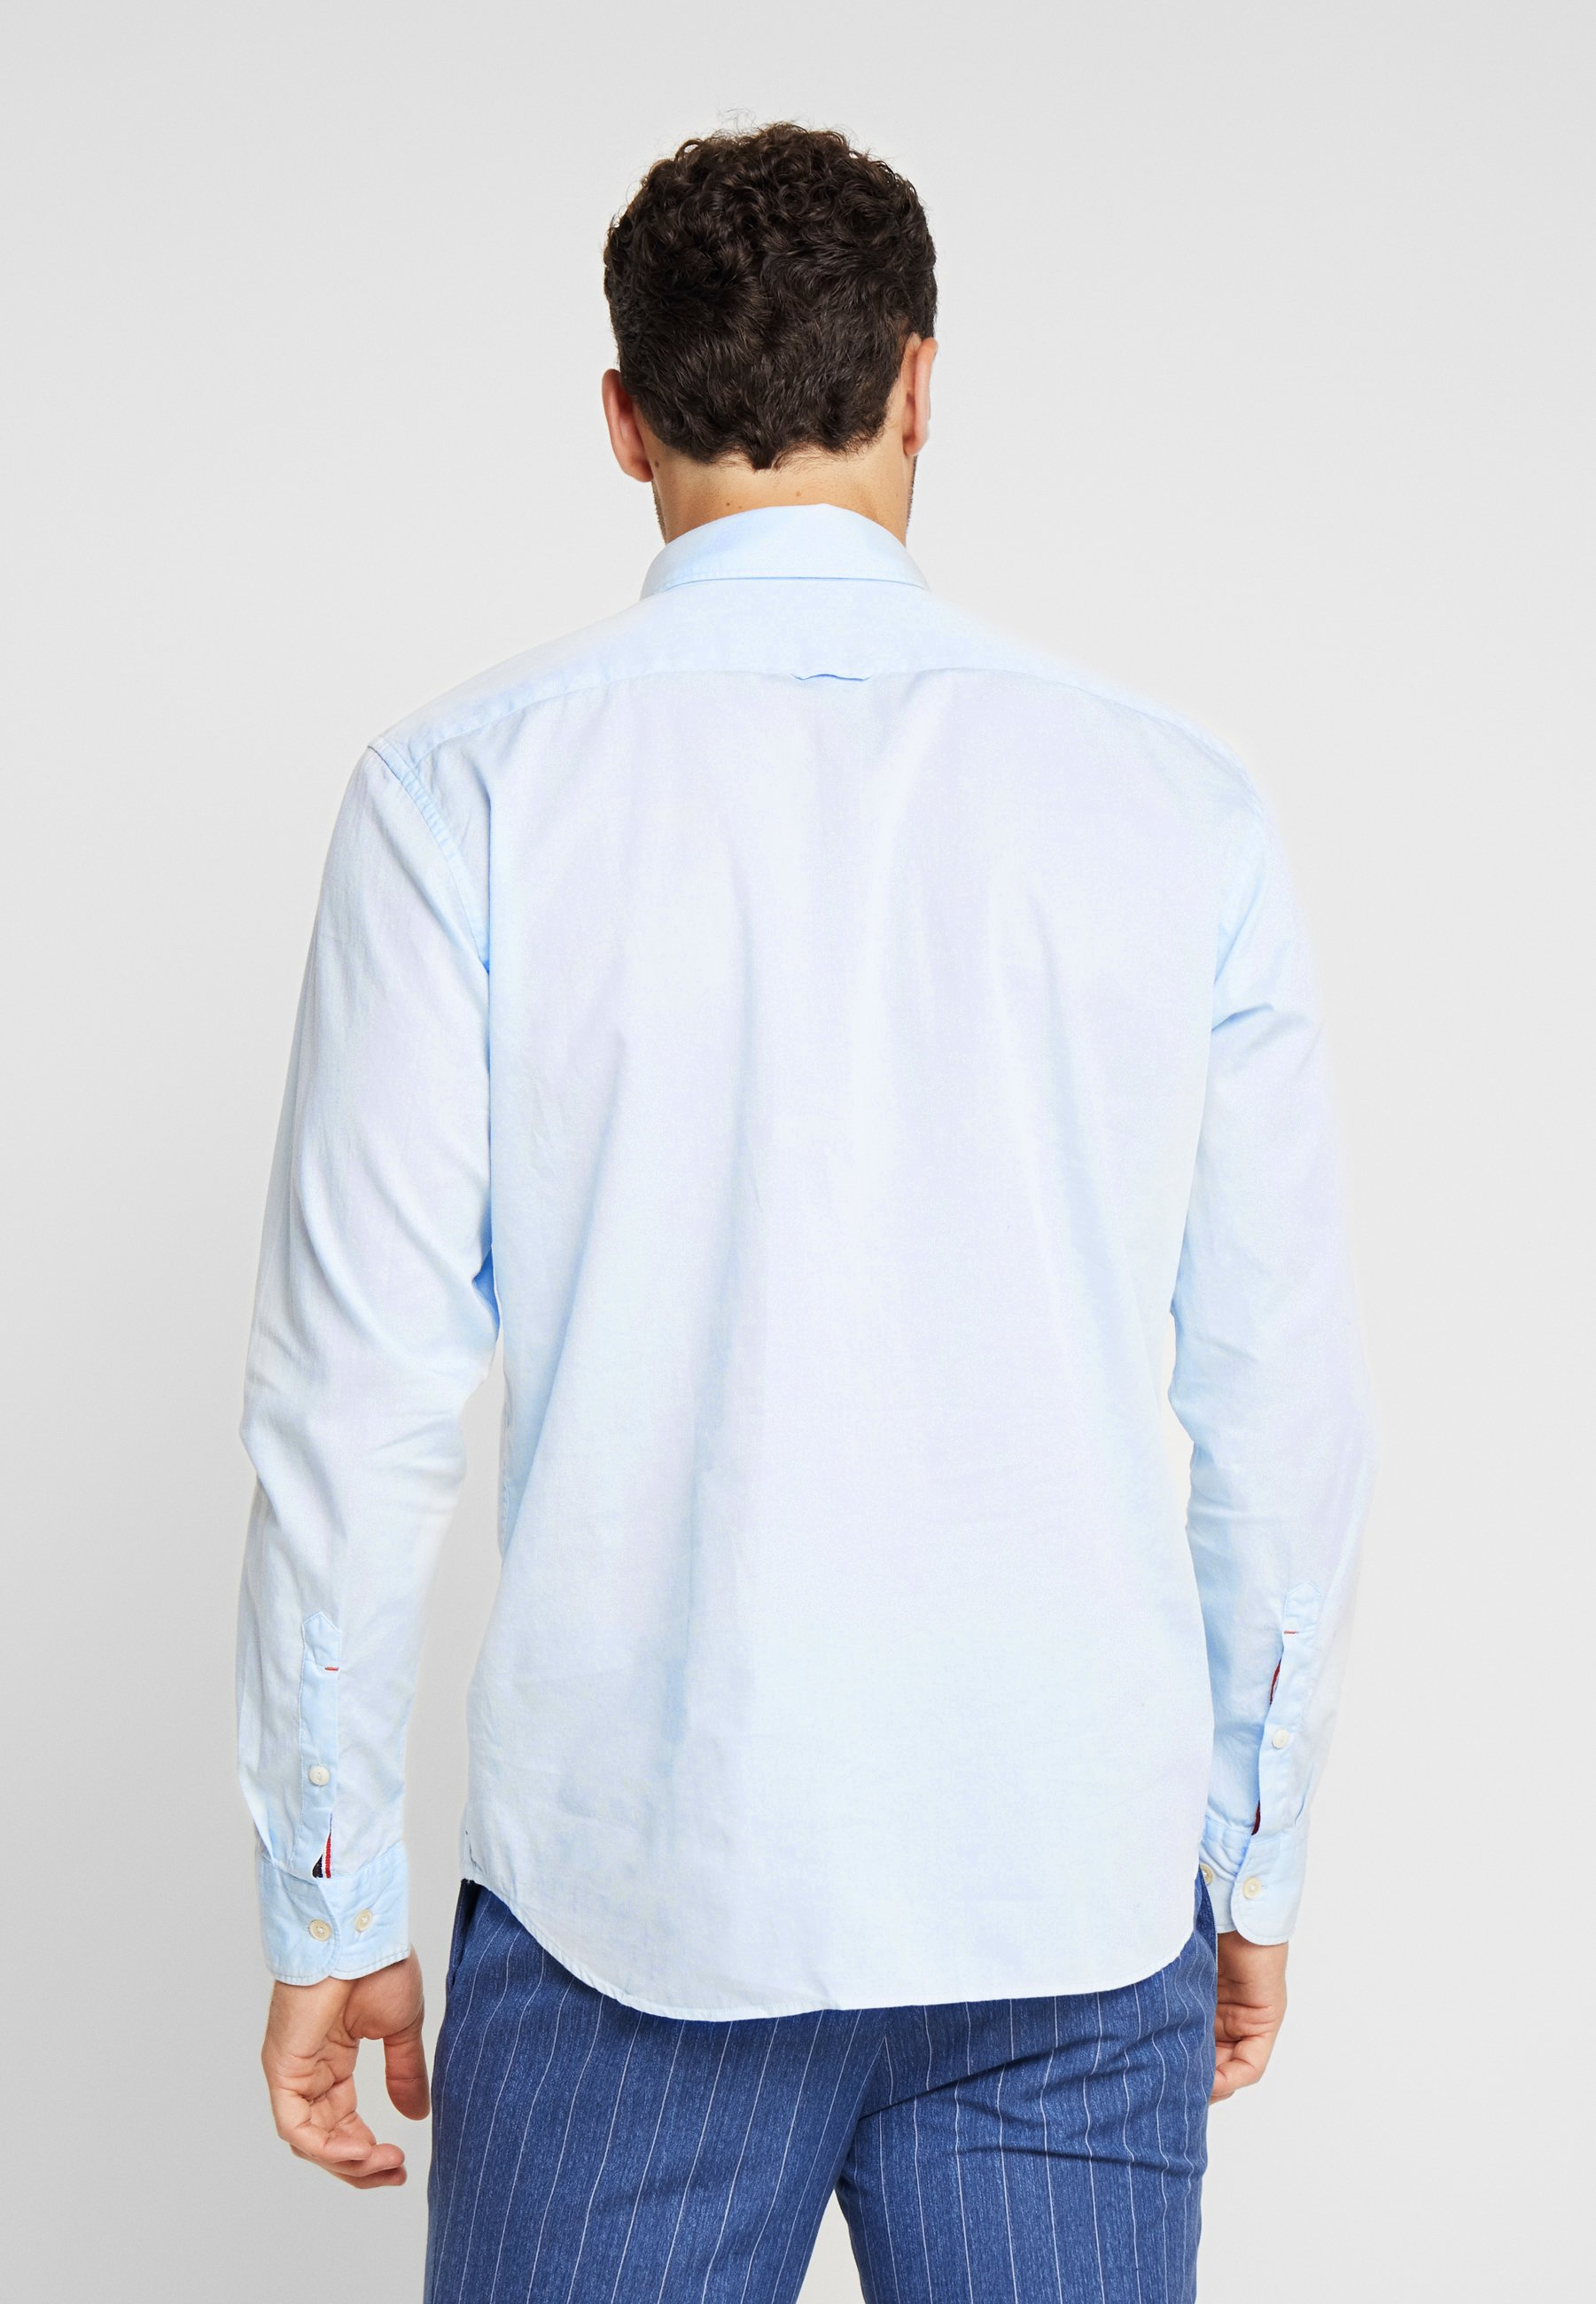 Marc Airblue Fine Bedford Garment DyedCamicia O'polo wknO80PX